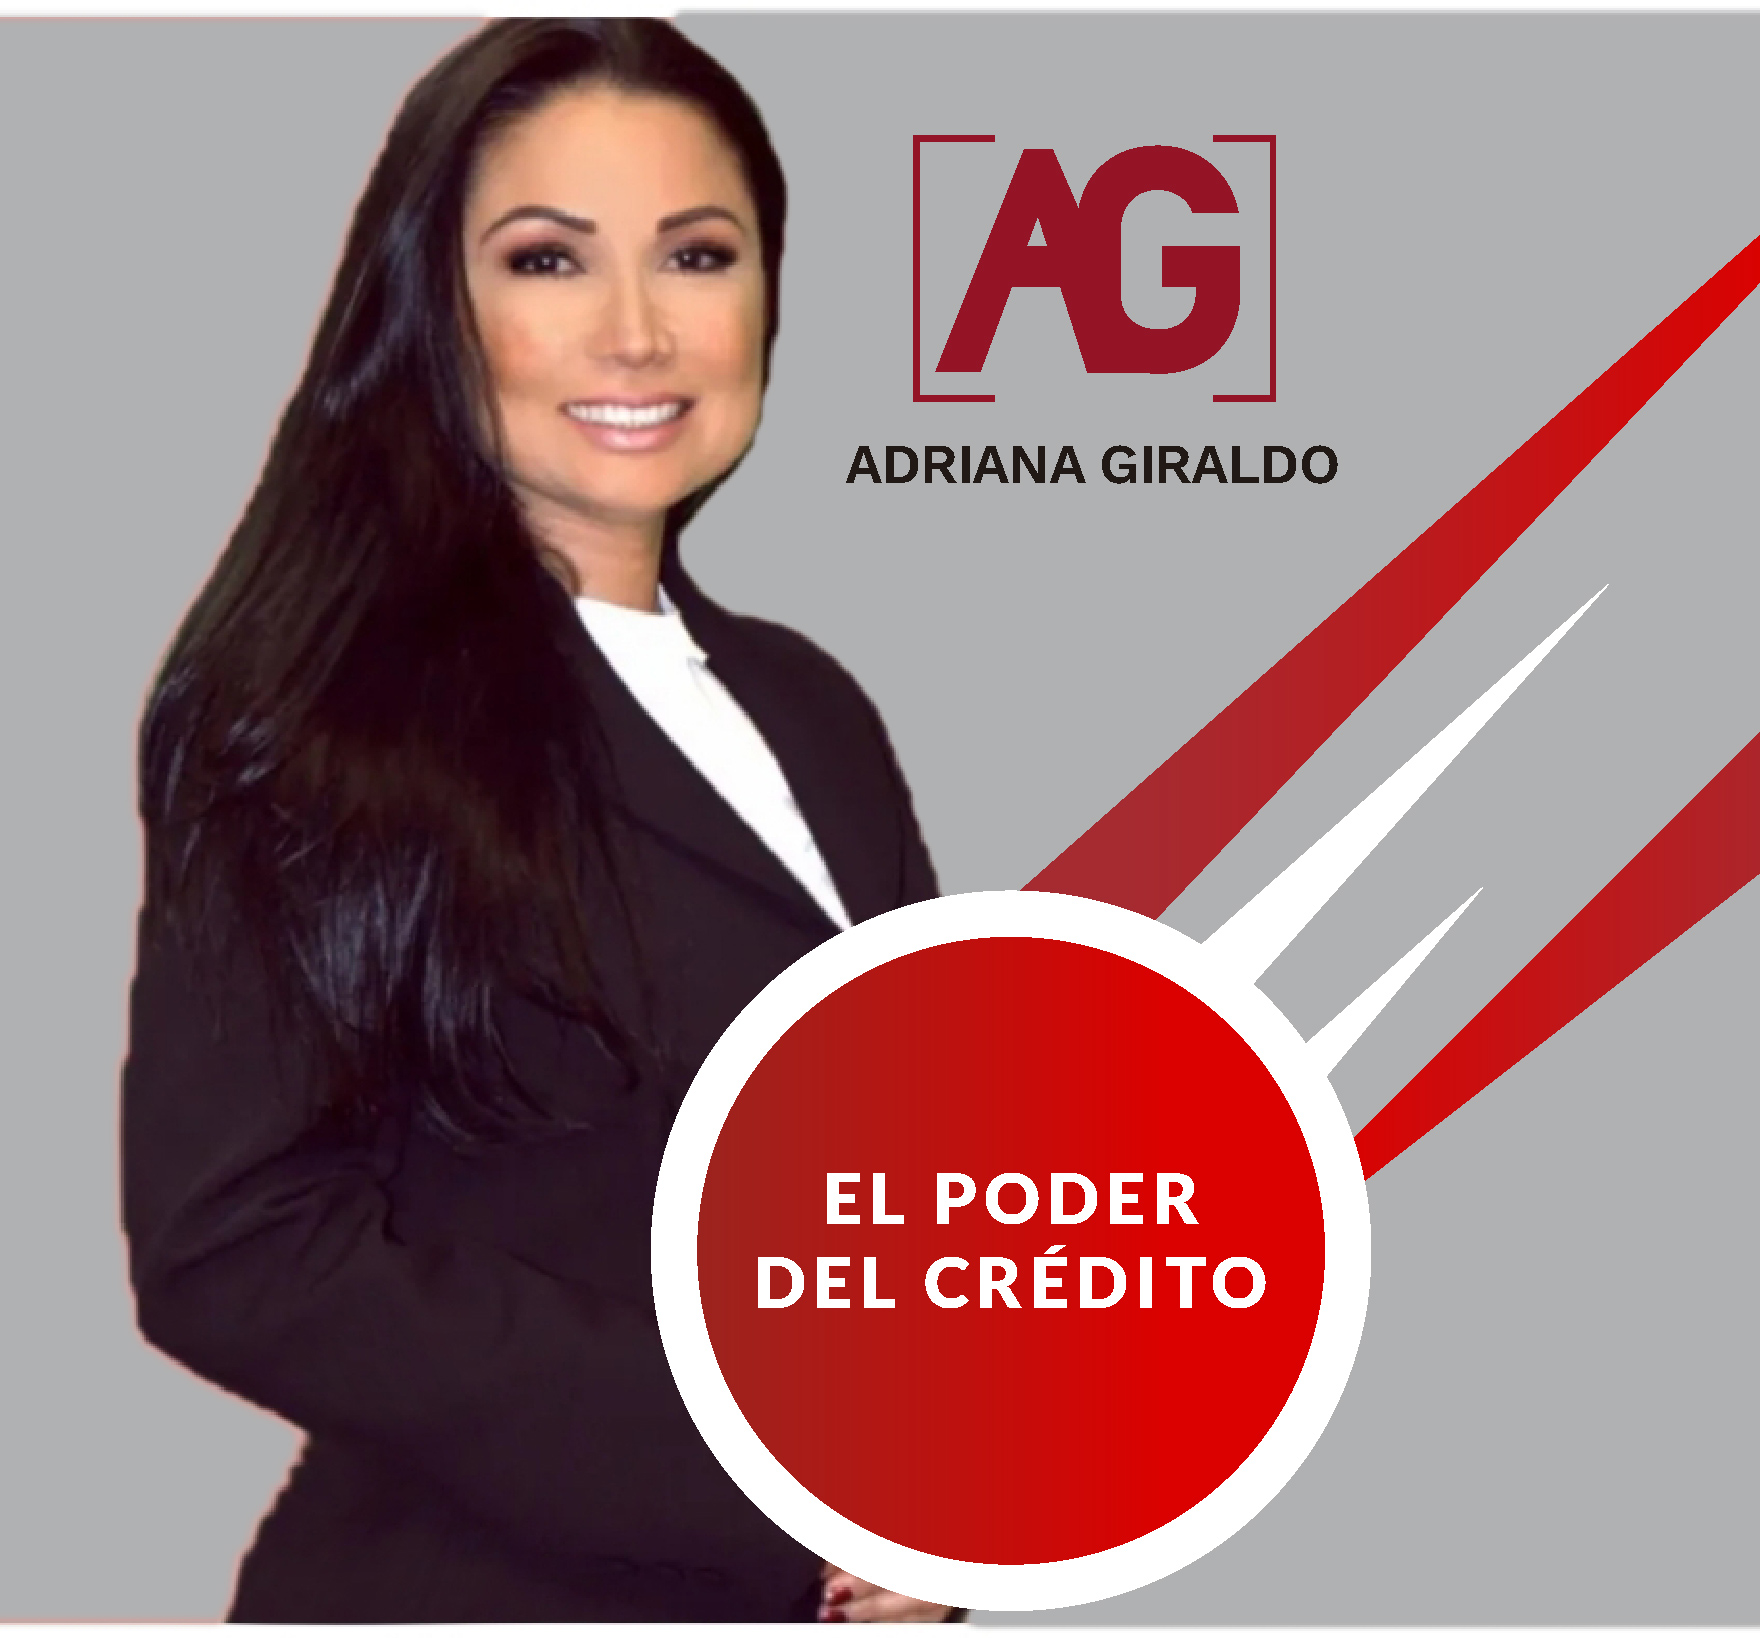 Adriana Giraldo